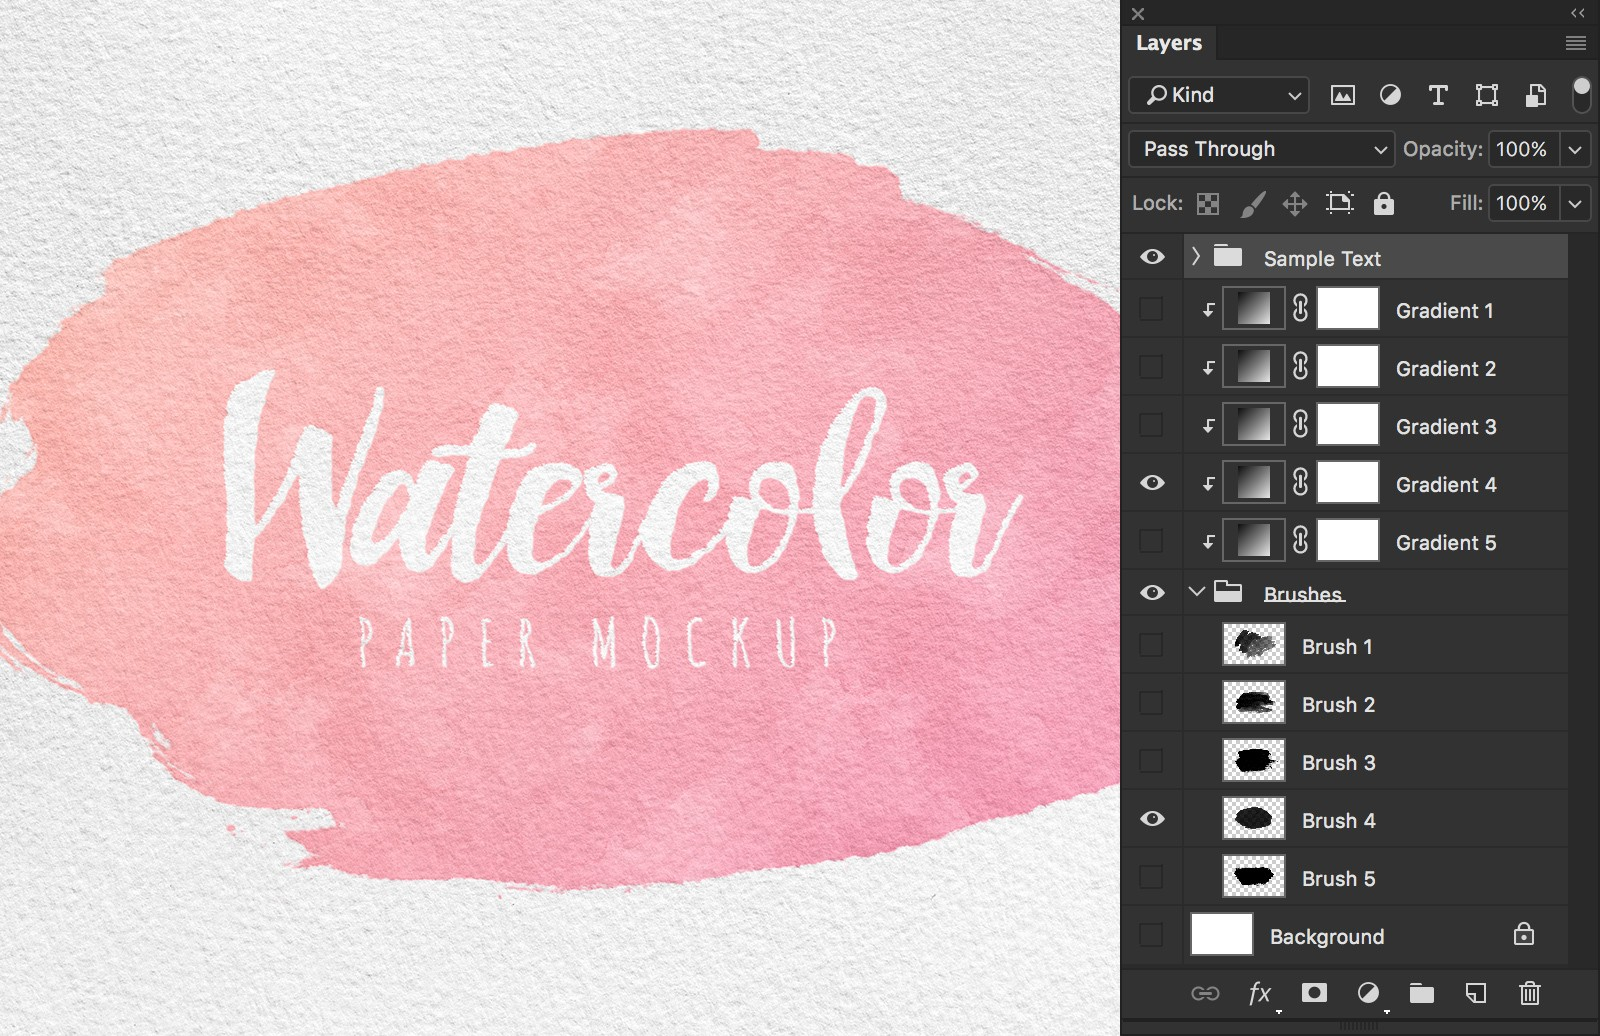 Watercolor Paper Mockup Preview 4